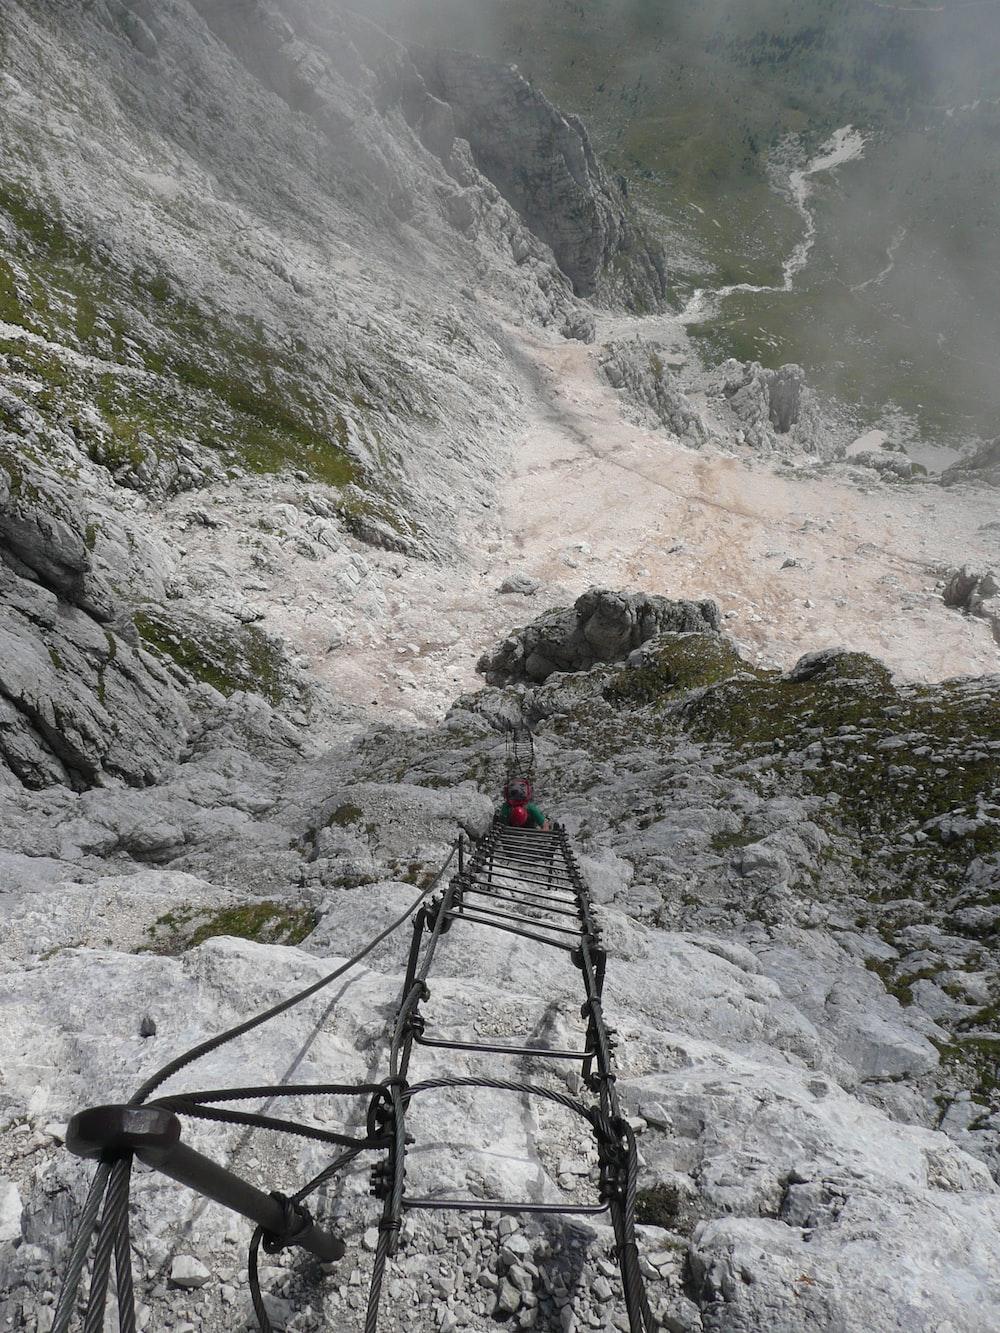 black metal ladder on rocky mountain